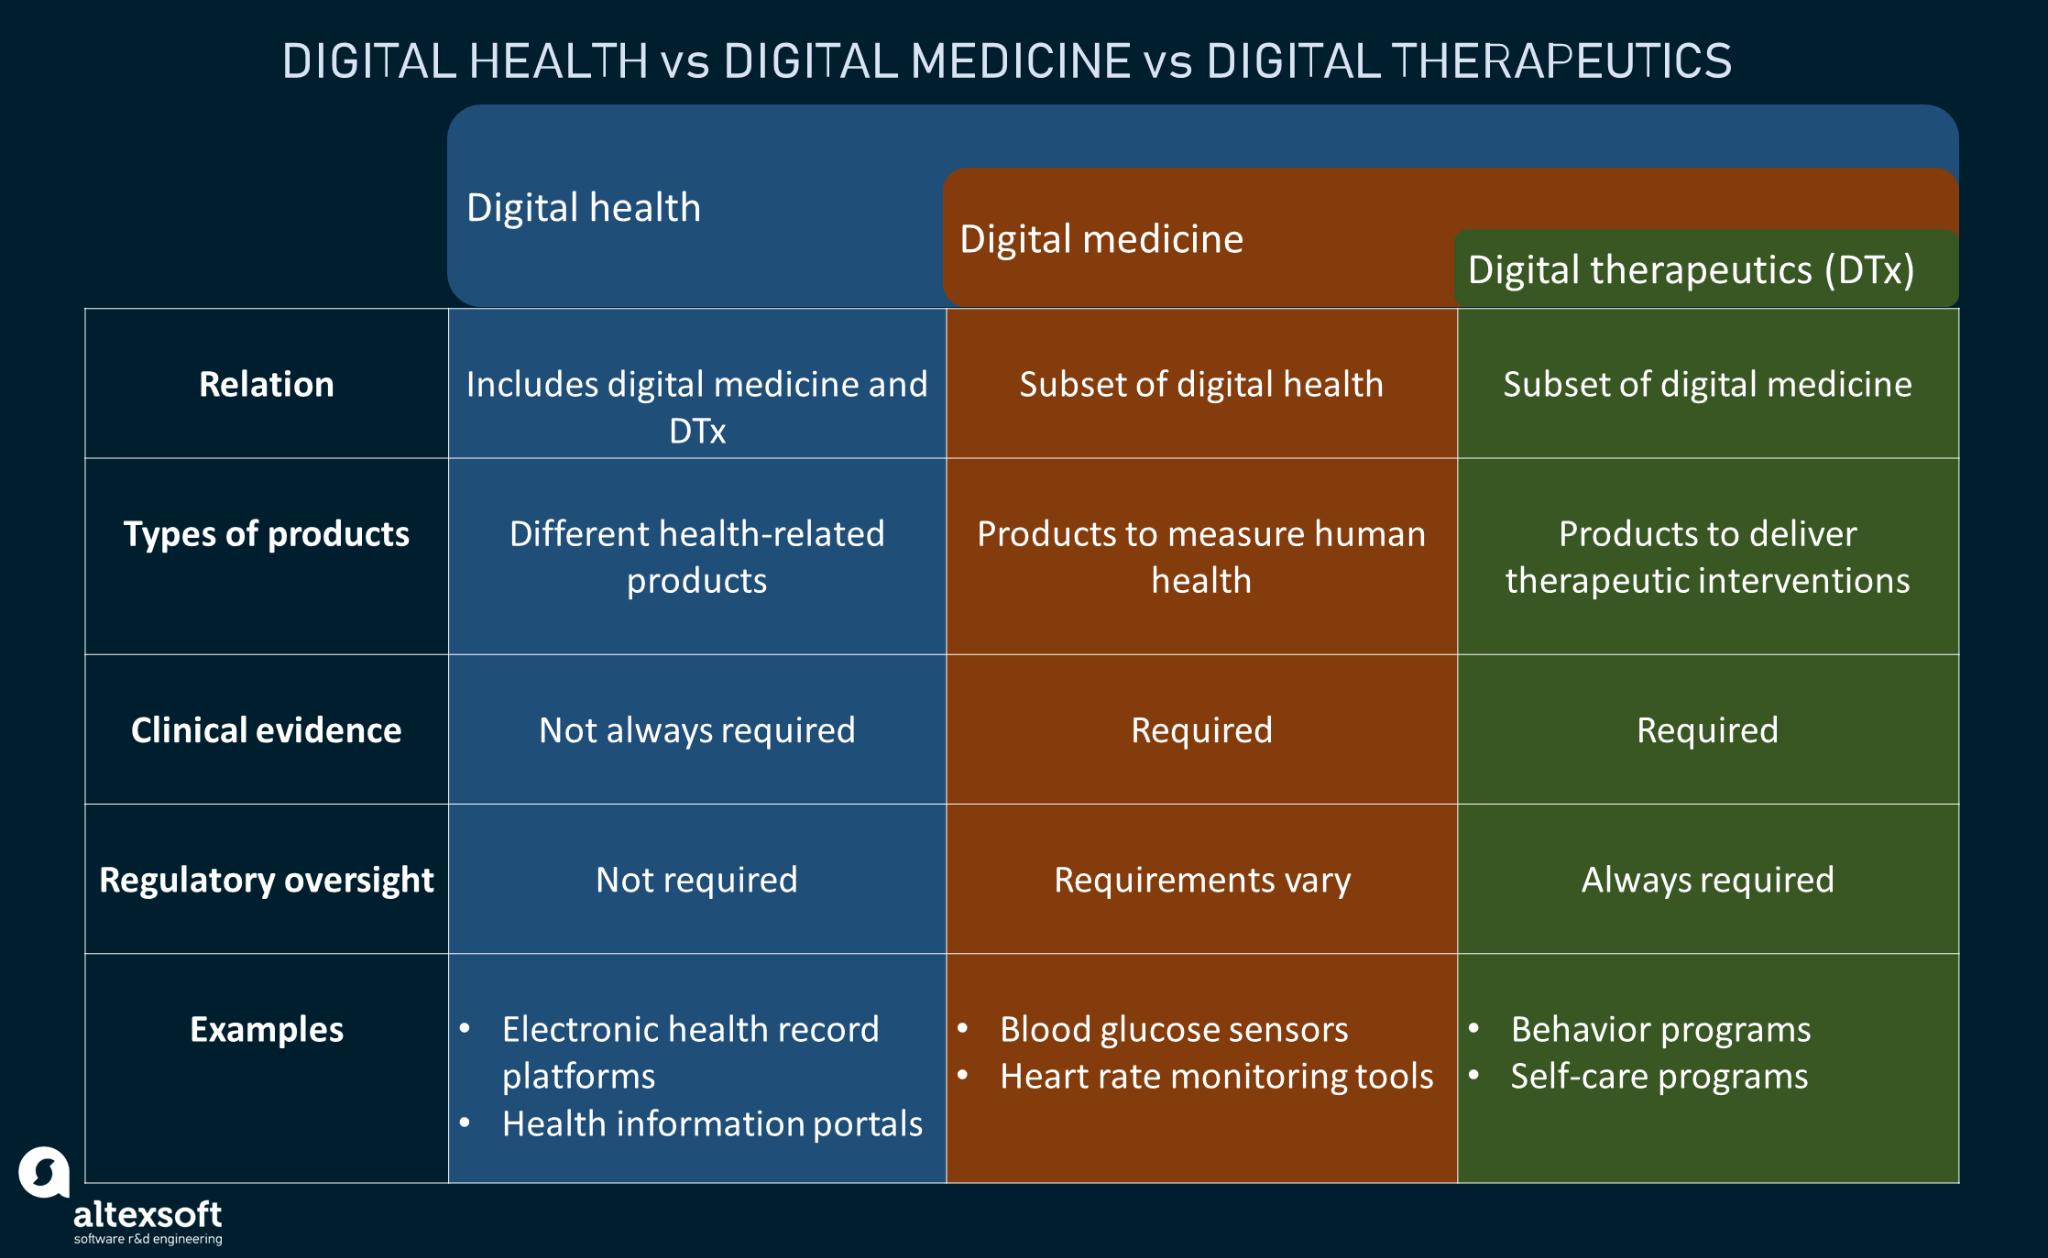 Digital health, digital medicine, and digital therapeutics compared